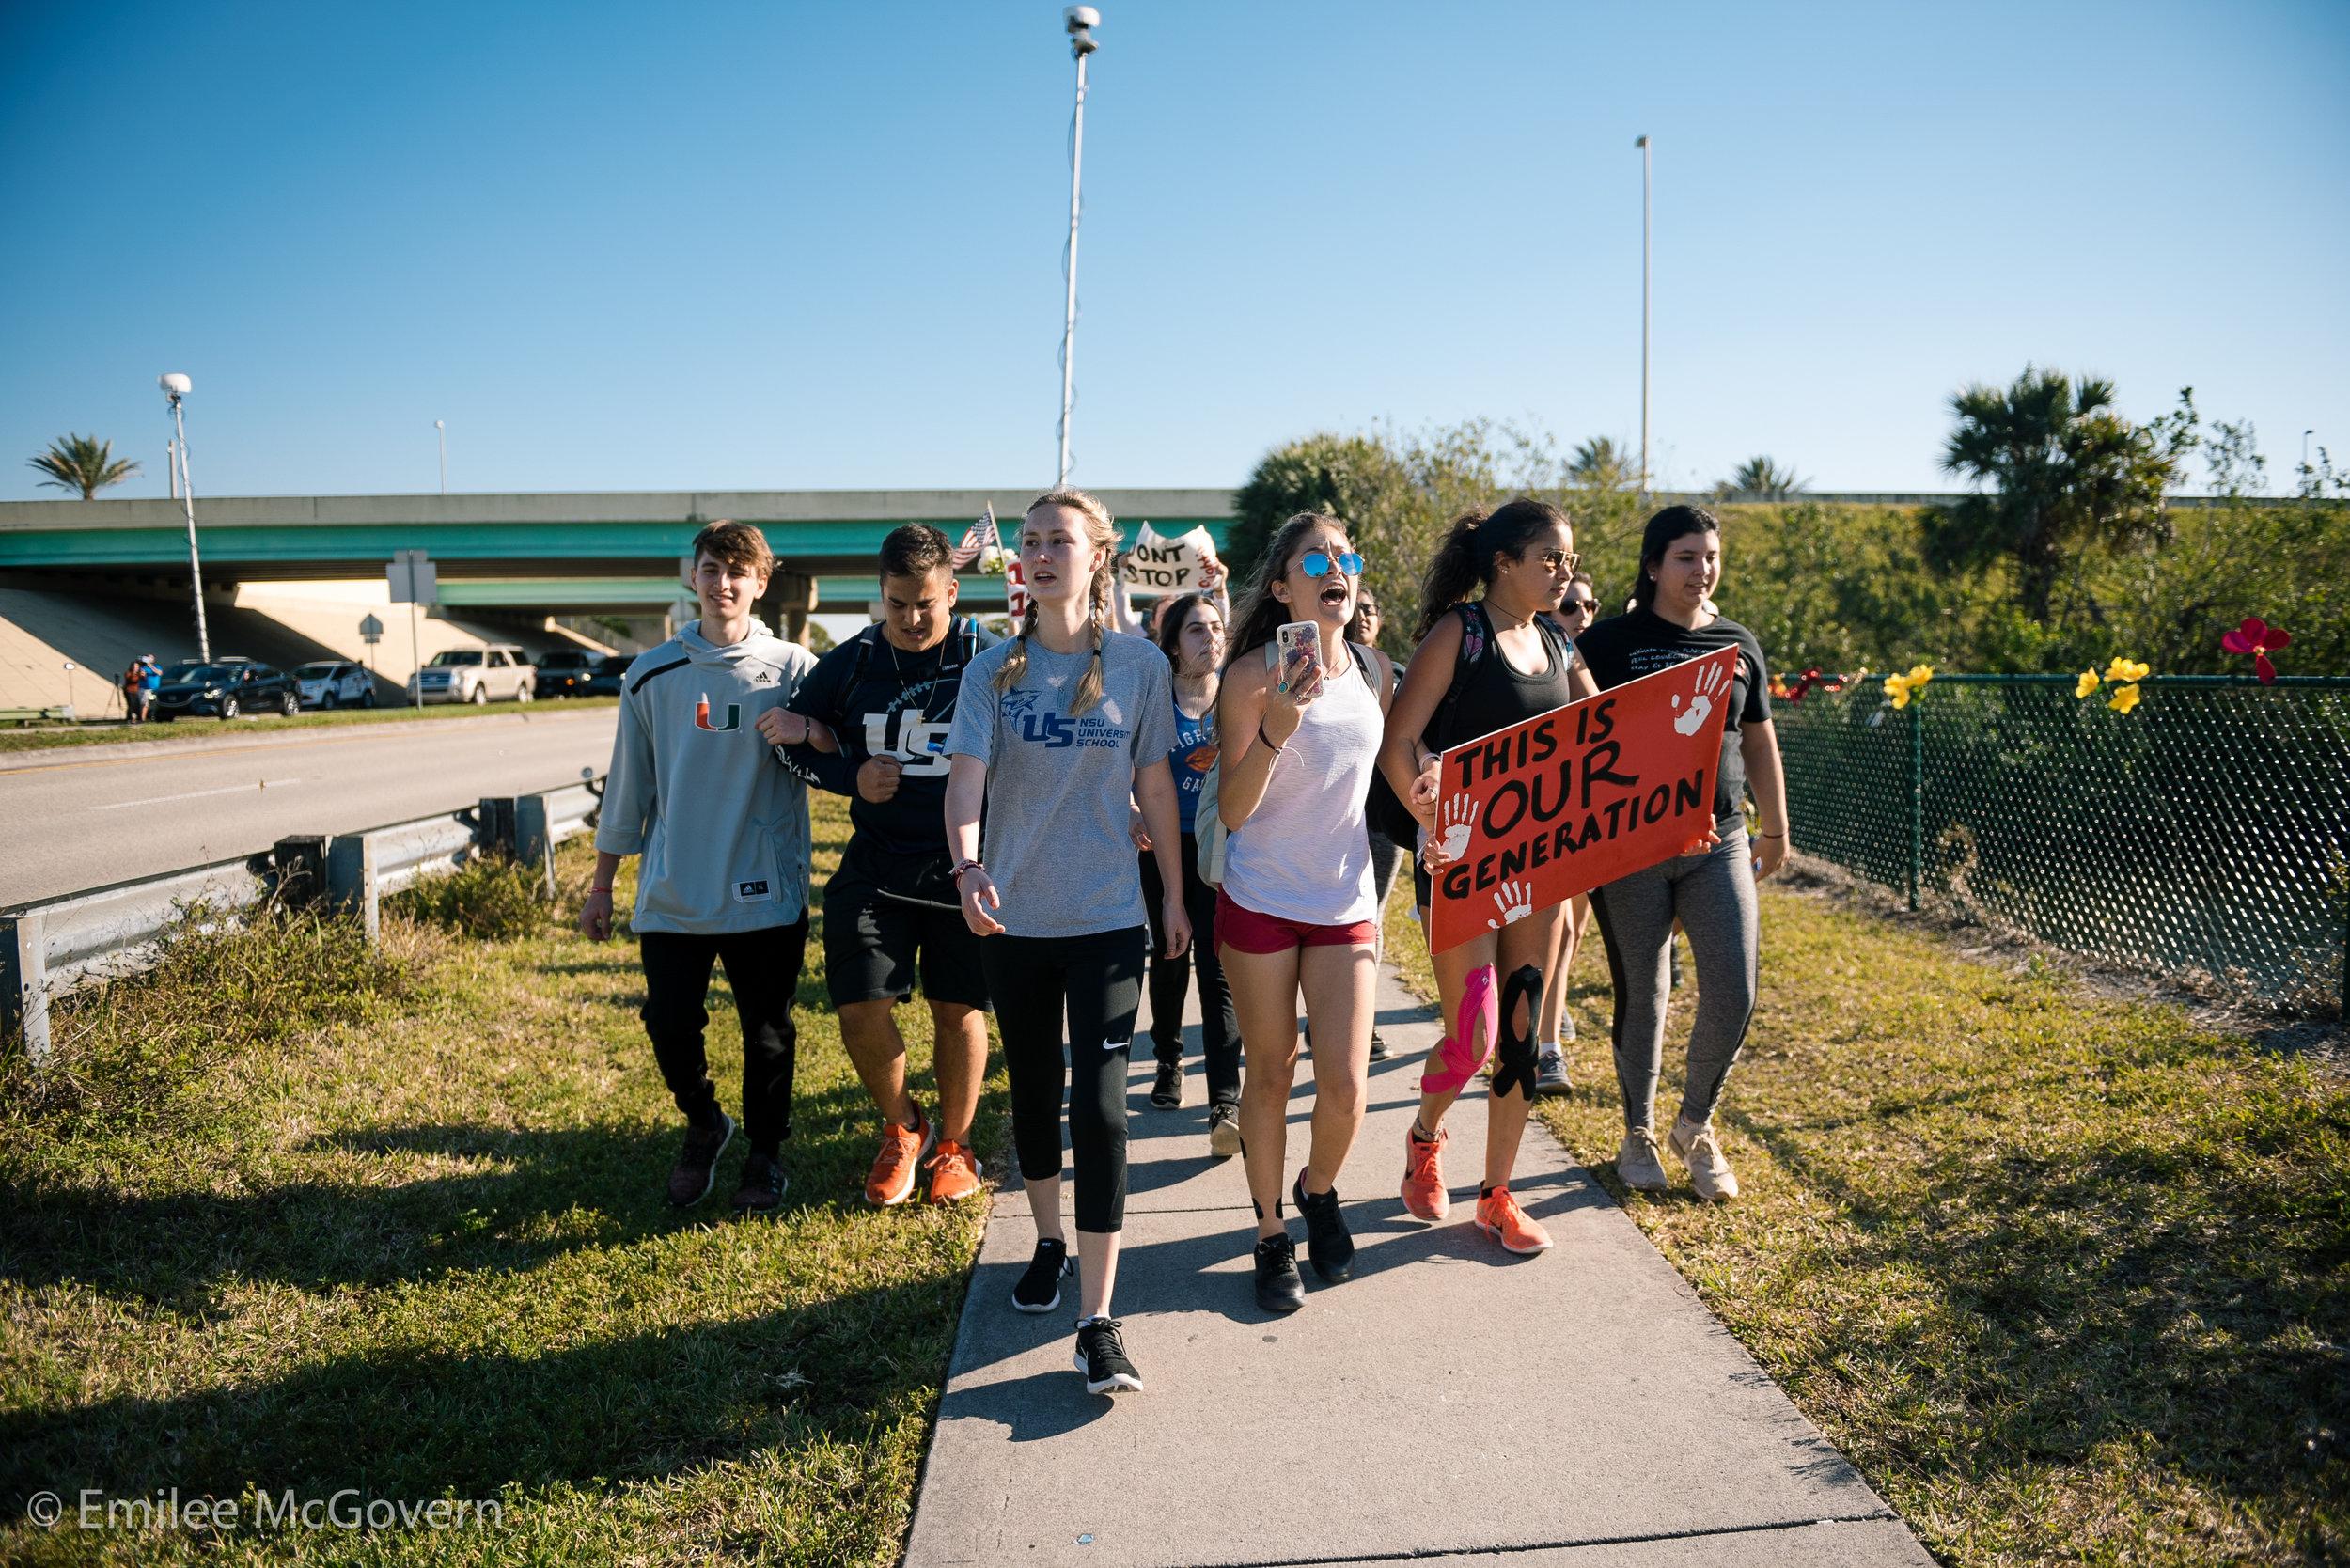 Marjory Stoneman Douglas School Shooting never again enough is enough emma gonzalez david hogg msd national school walkout -118.jpg